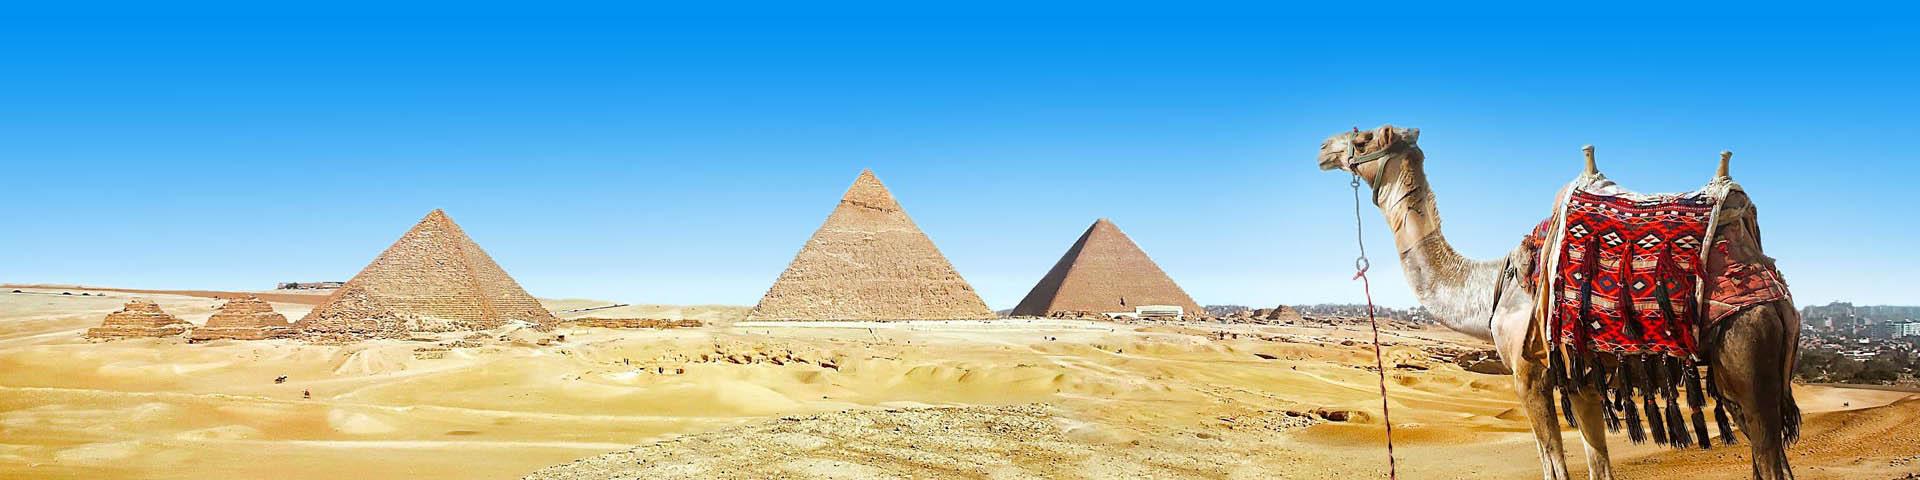 Pyramides en kamelen in Egypte